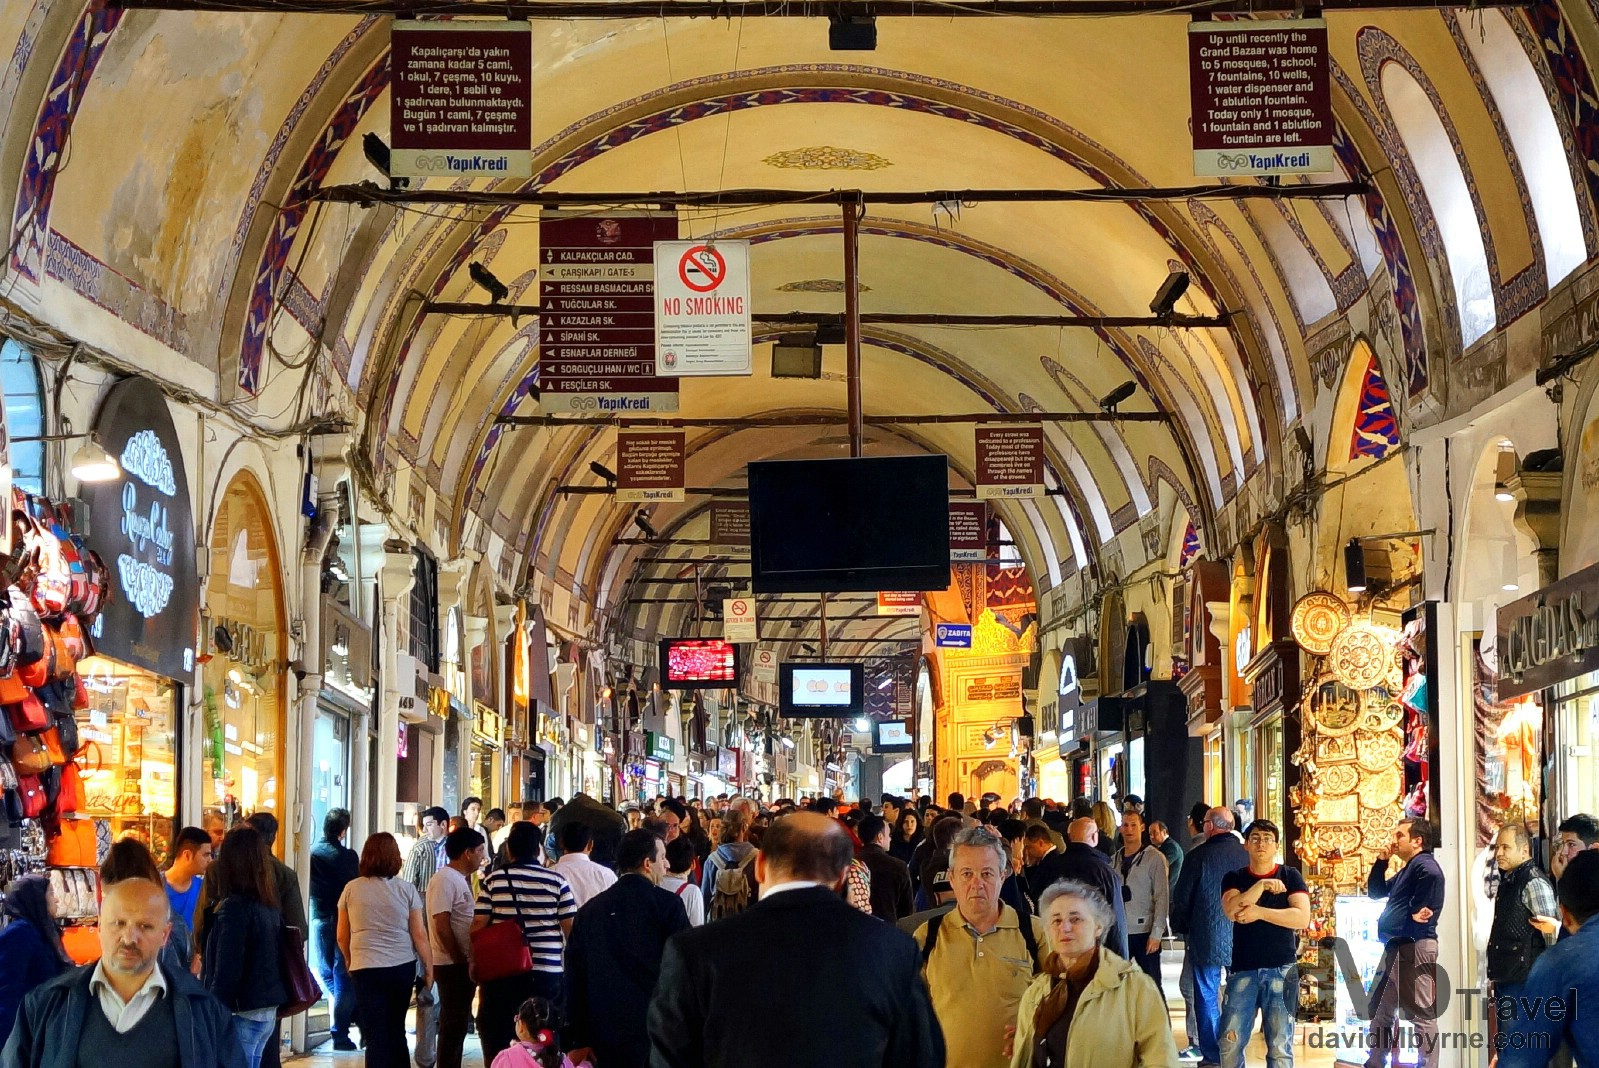 The Grand Bazaar, Istanbul, Turkey. April 10th, 2014.